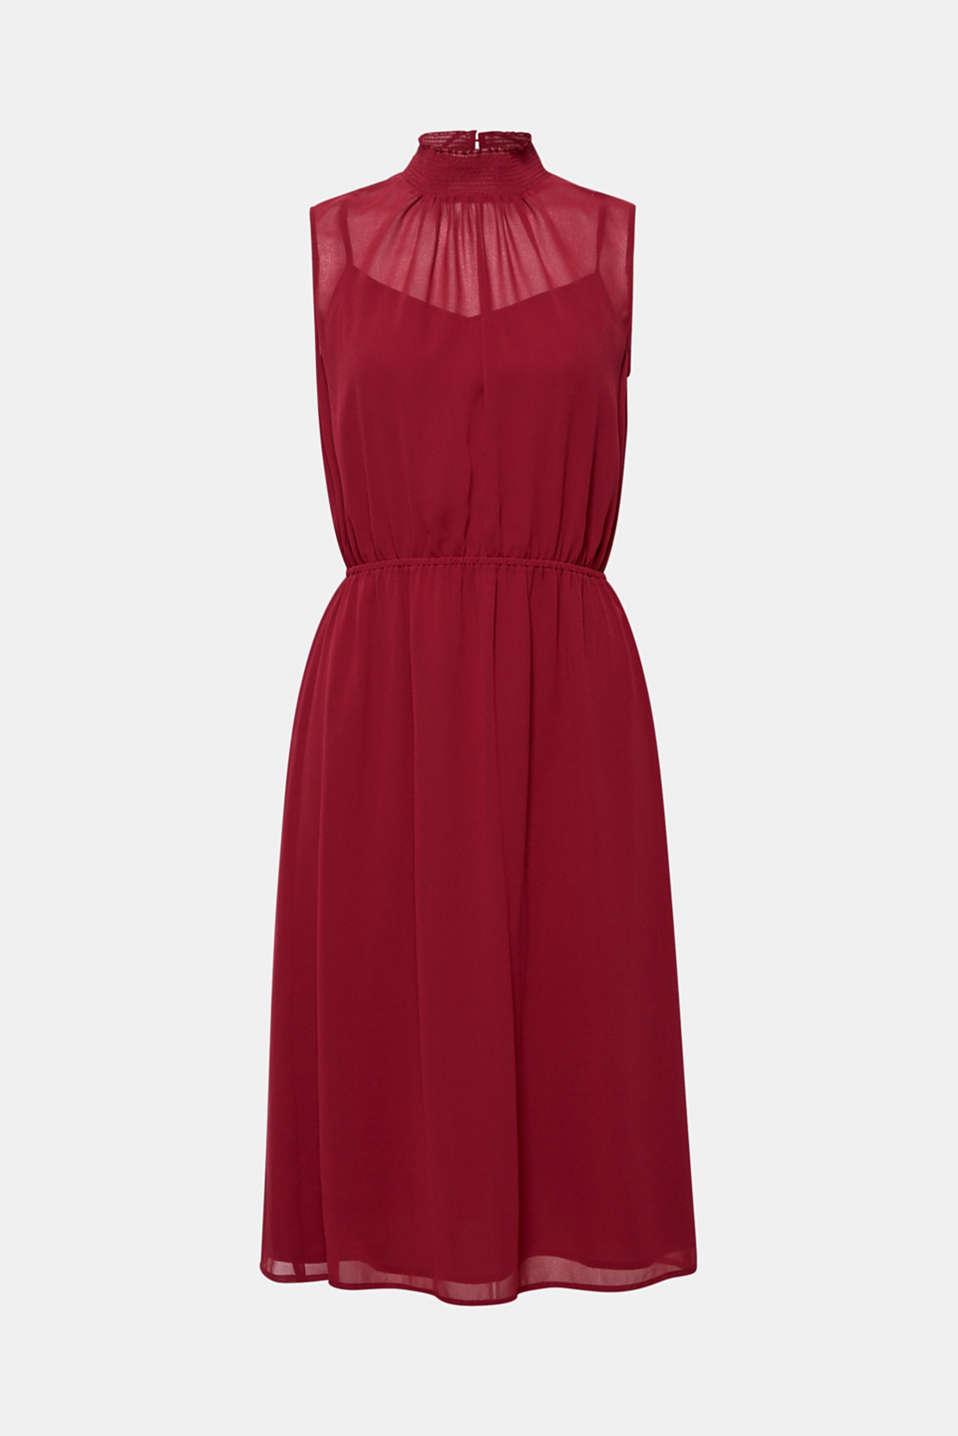 Chiffon dress with slip, GARNET RED, detail image number 6